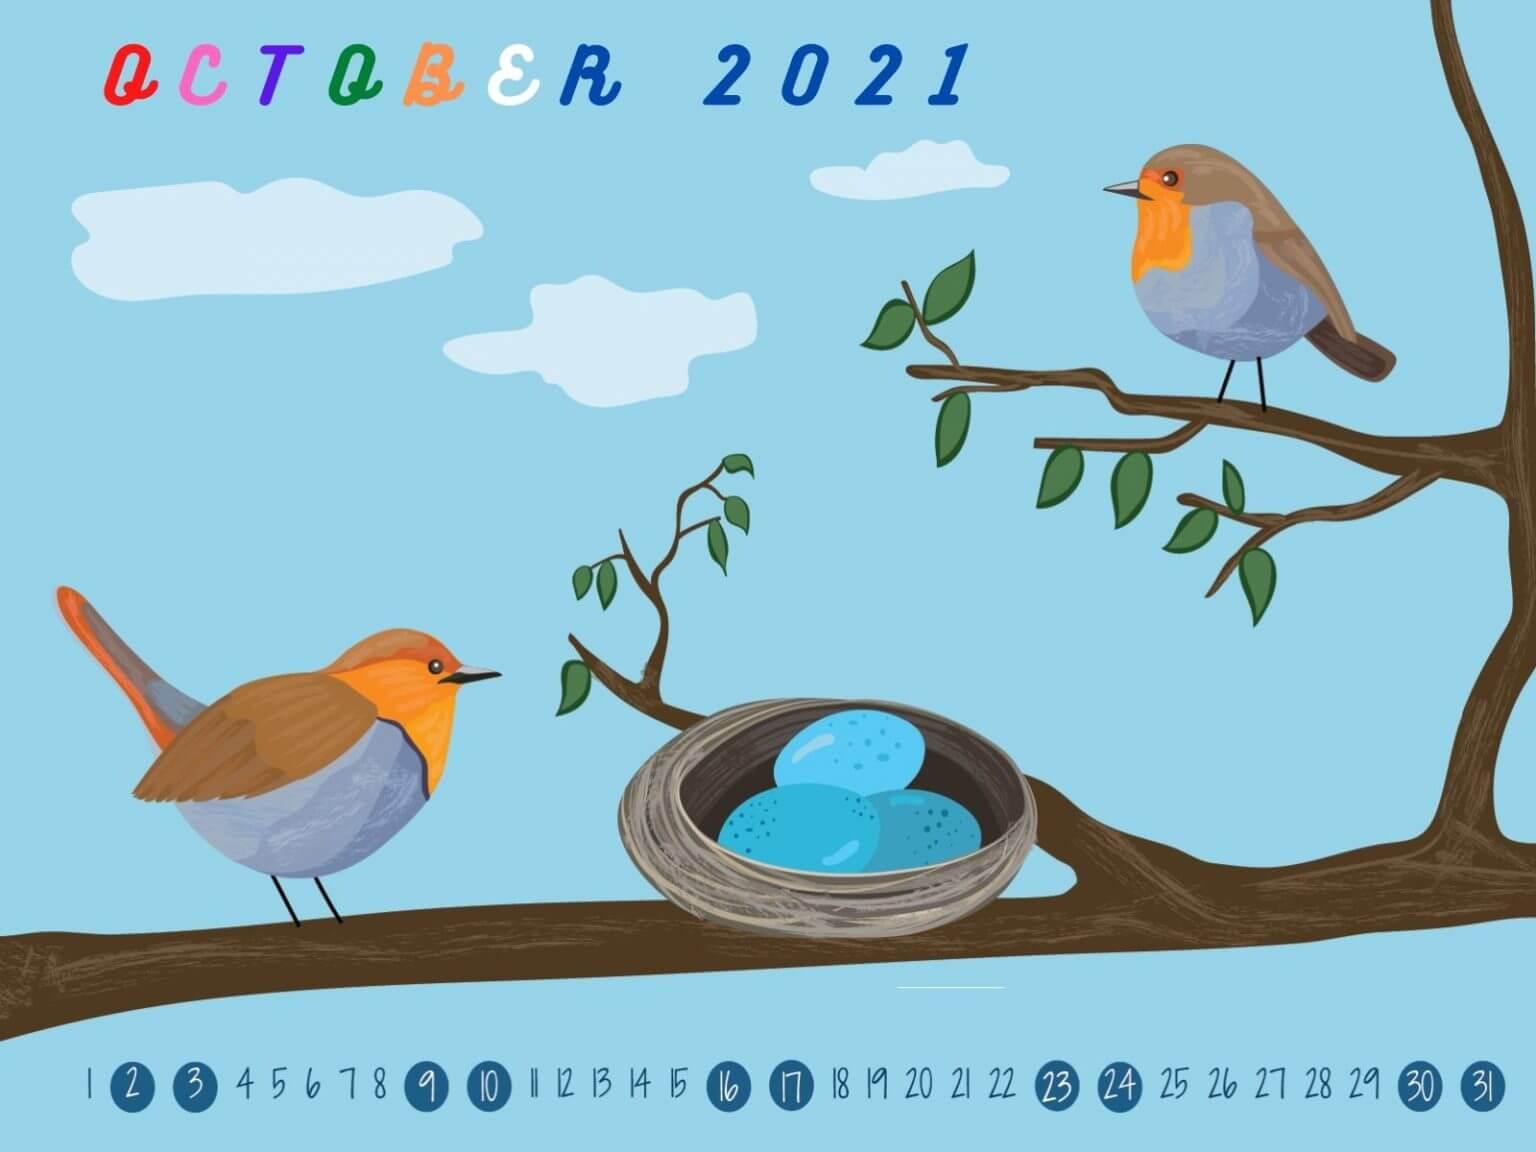 October 2021 Screensaver Background Calendar